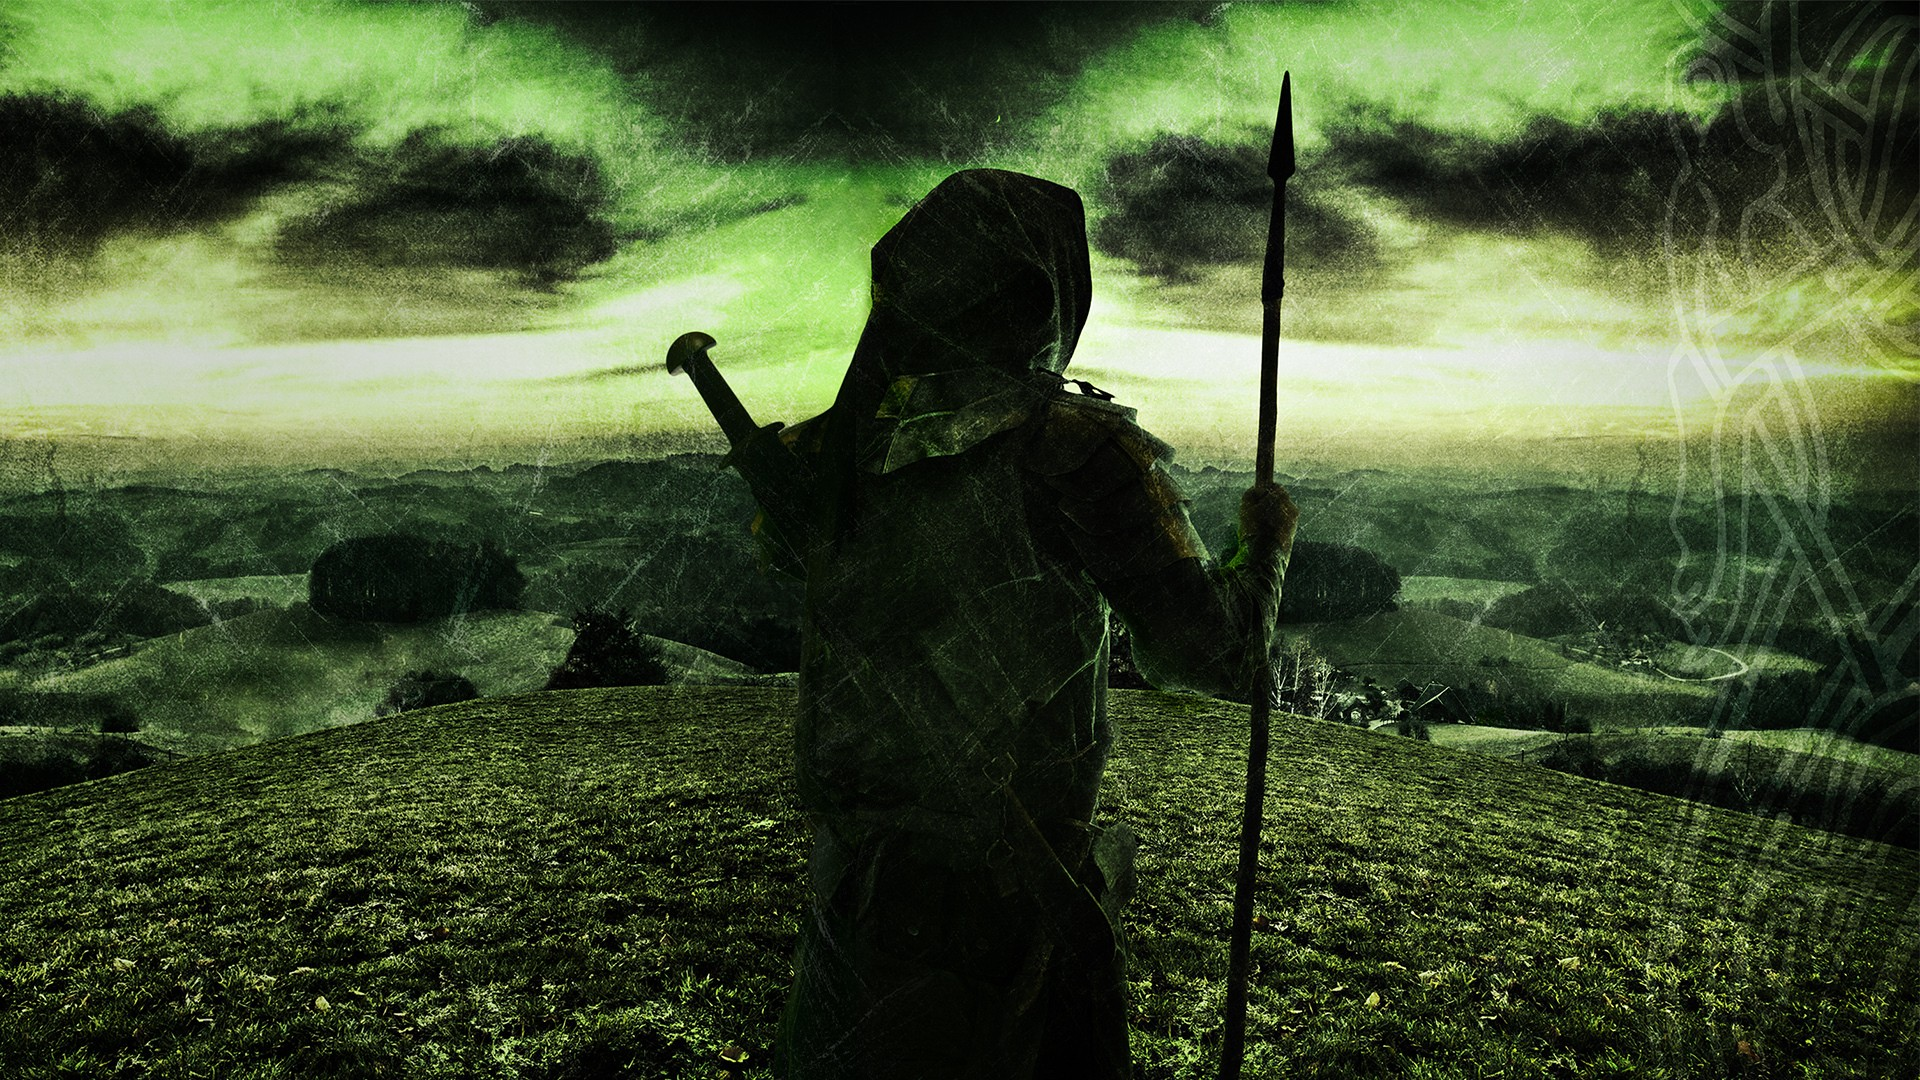 Pagan Wallpaper ·① Download Free Stunning Full HD